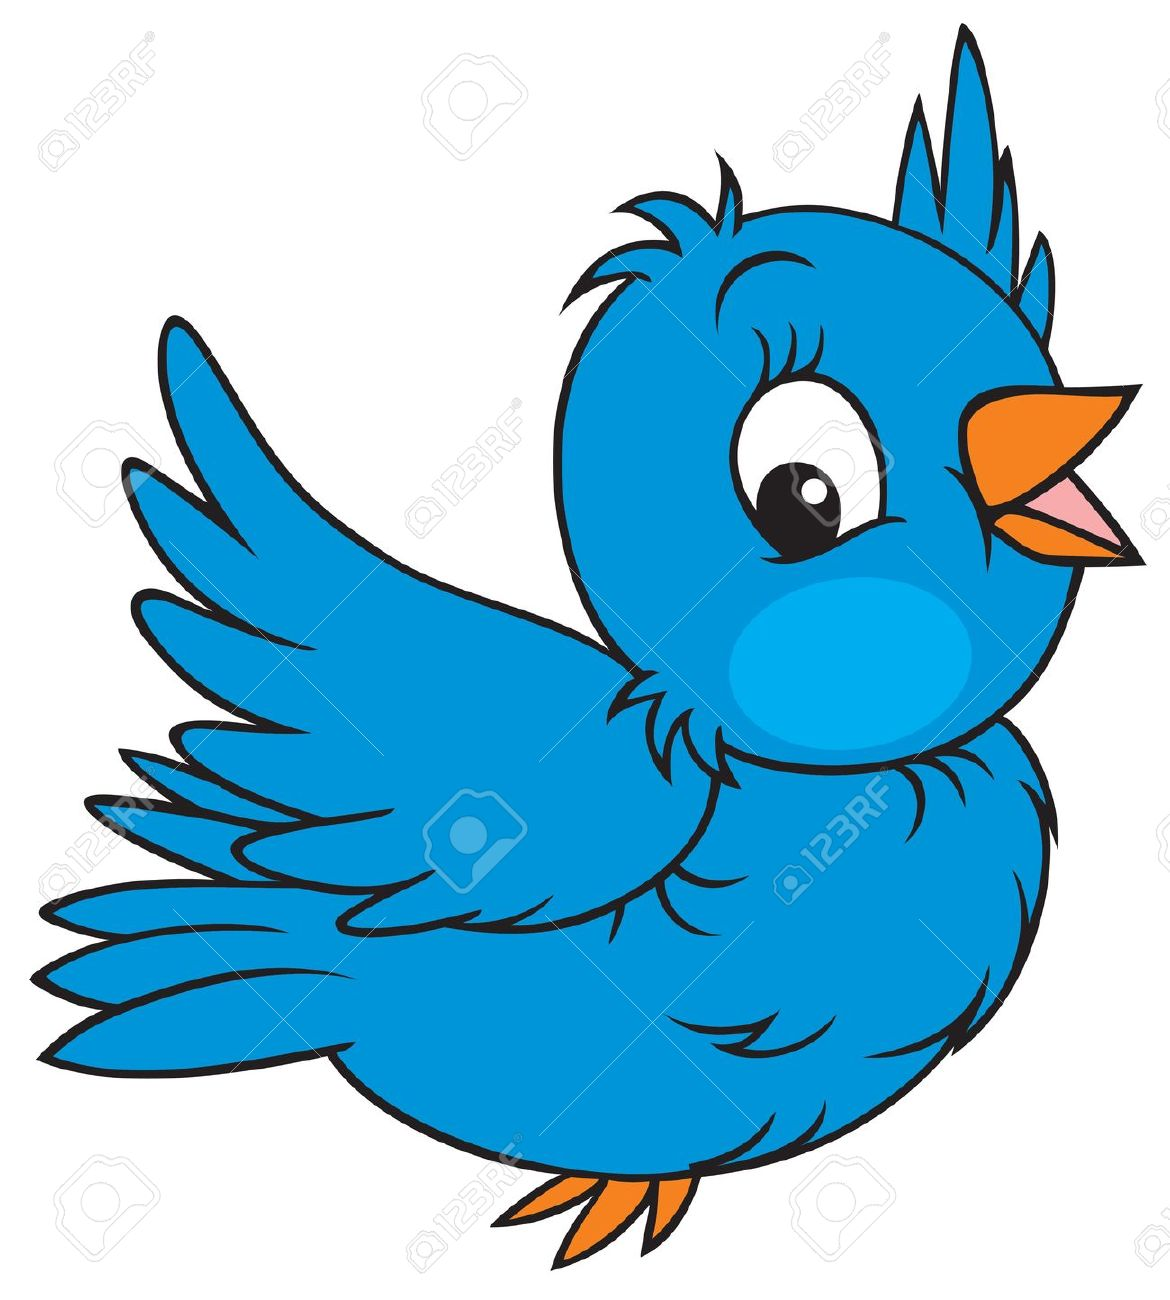 free bird clipart at getdrawings | free download  getdrawings.com